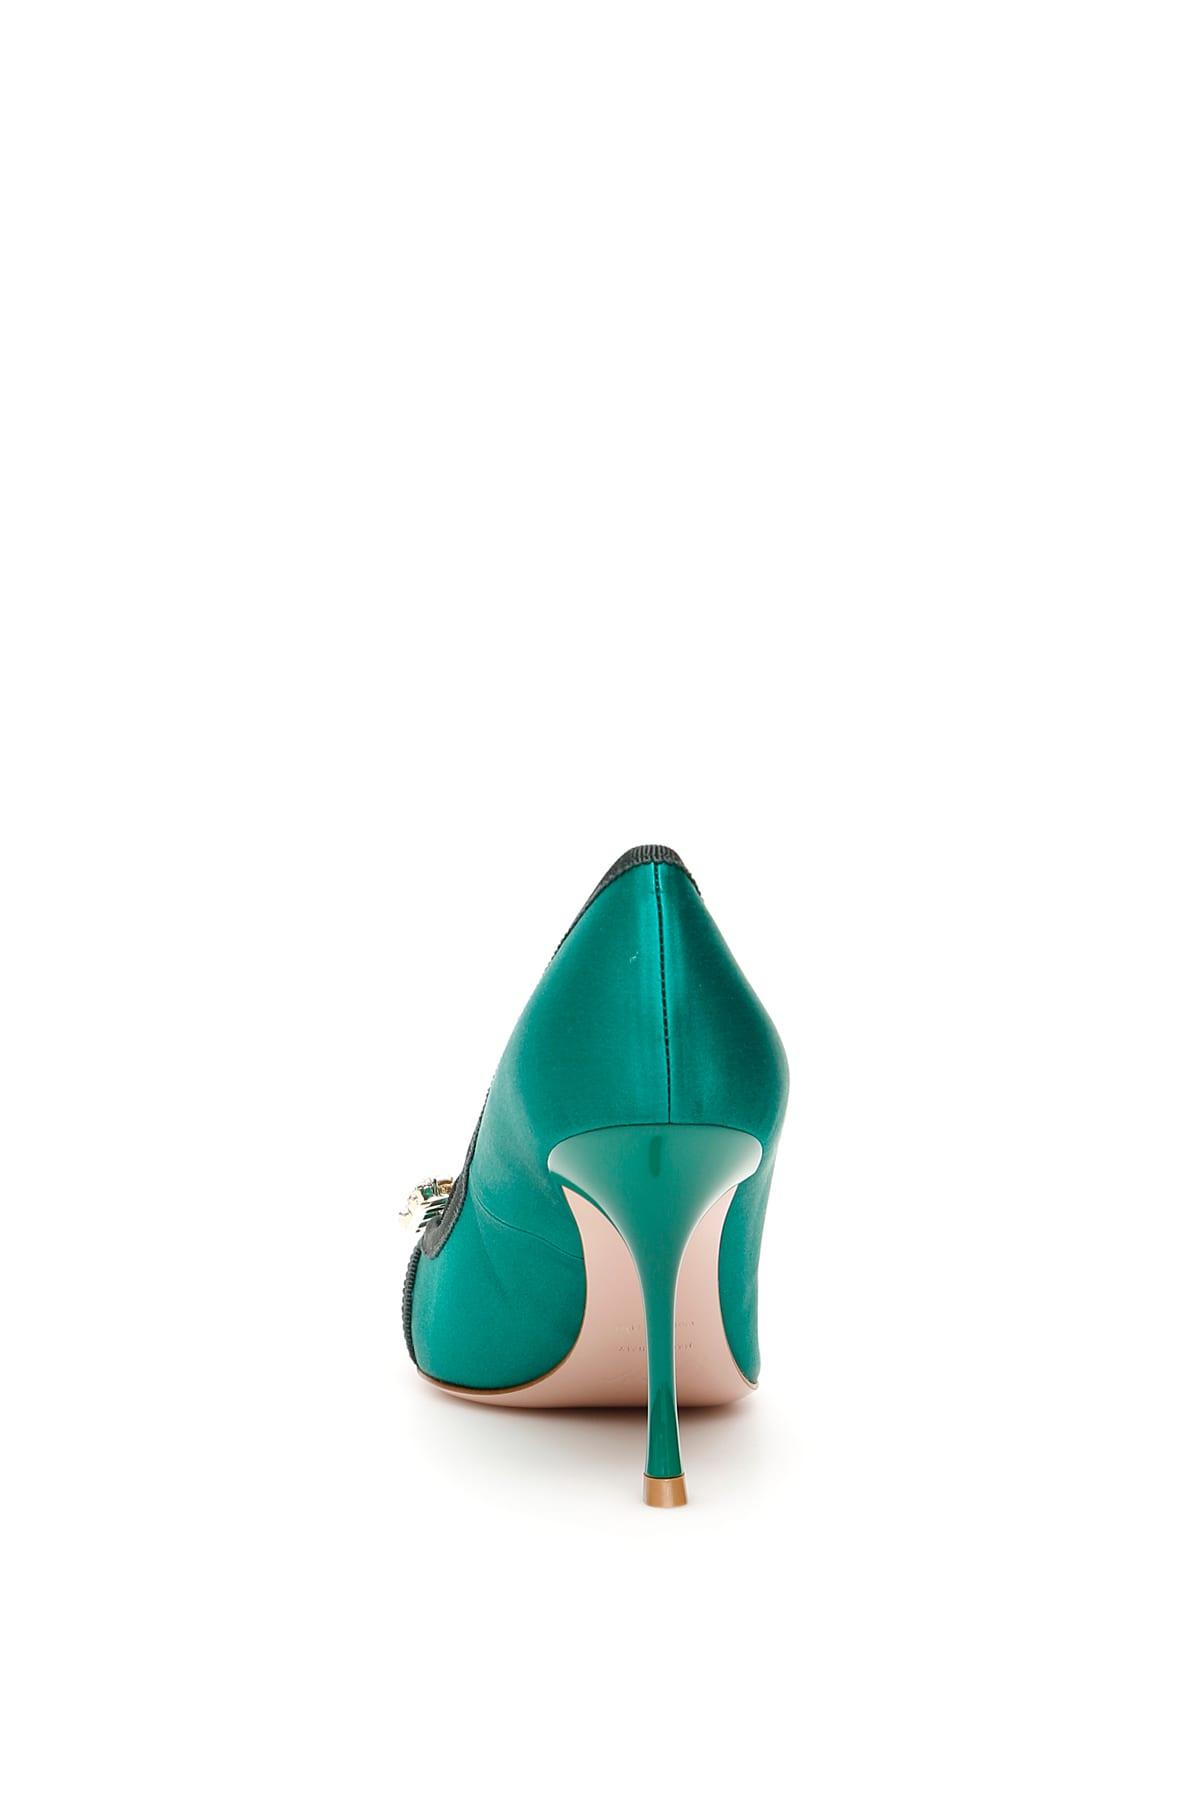 Roger Vivier High-heeled shoes